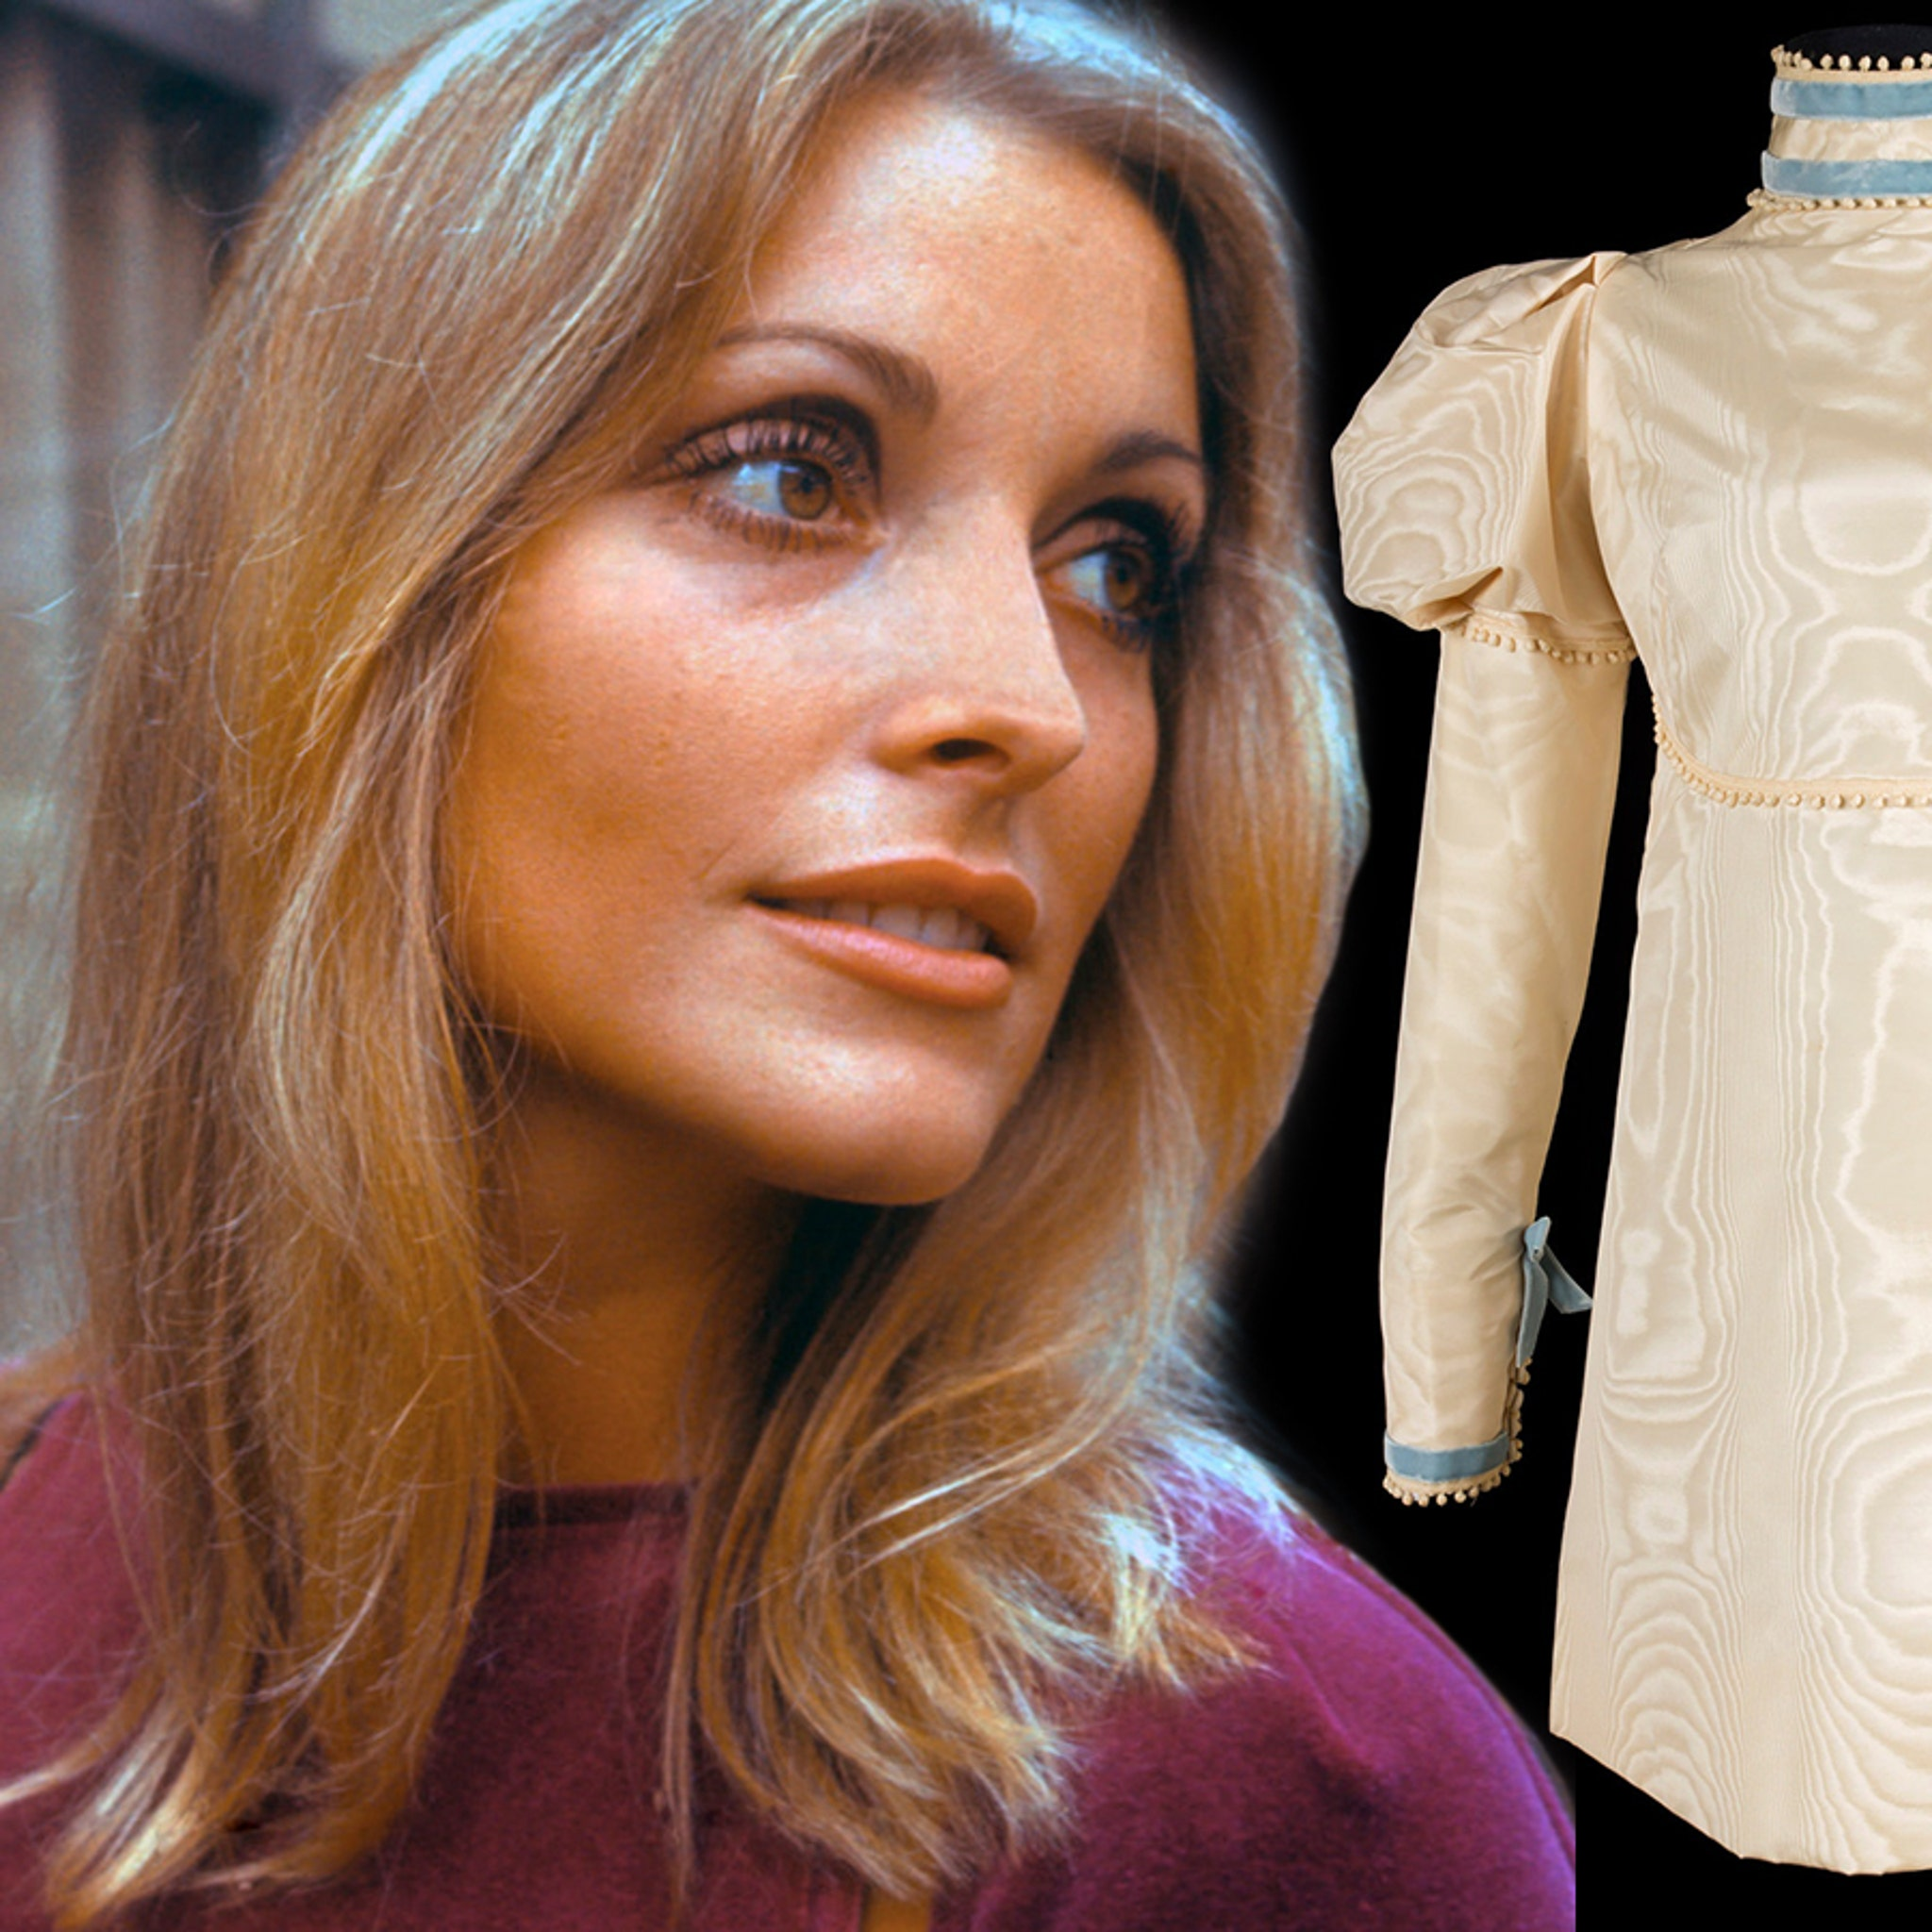 Sharon Tate's Wedding Dress Now at Zak Bagans' Haunted Museum